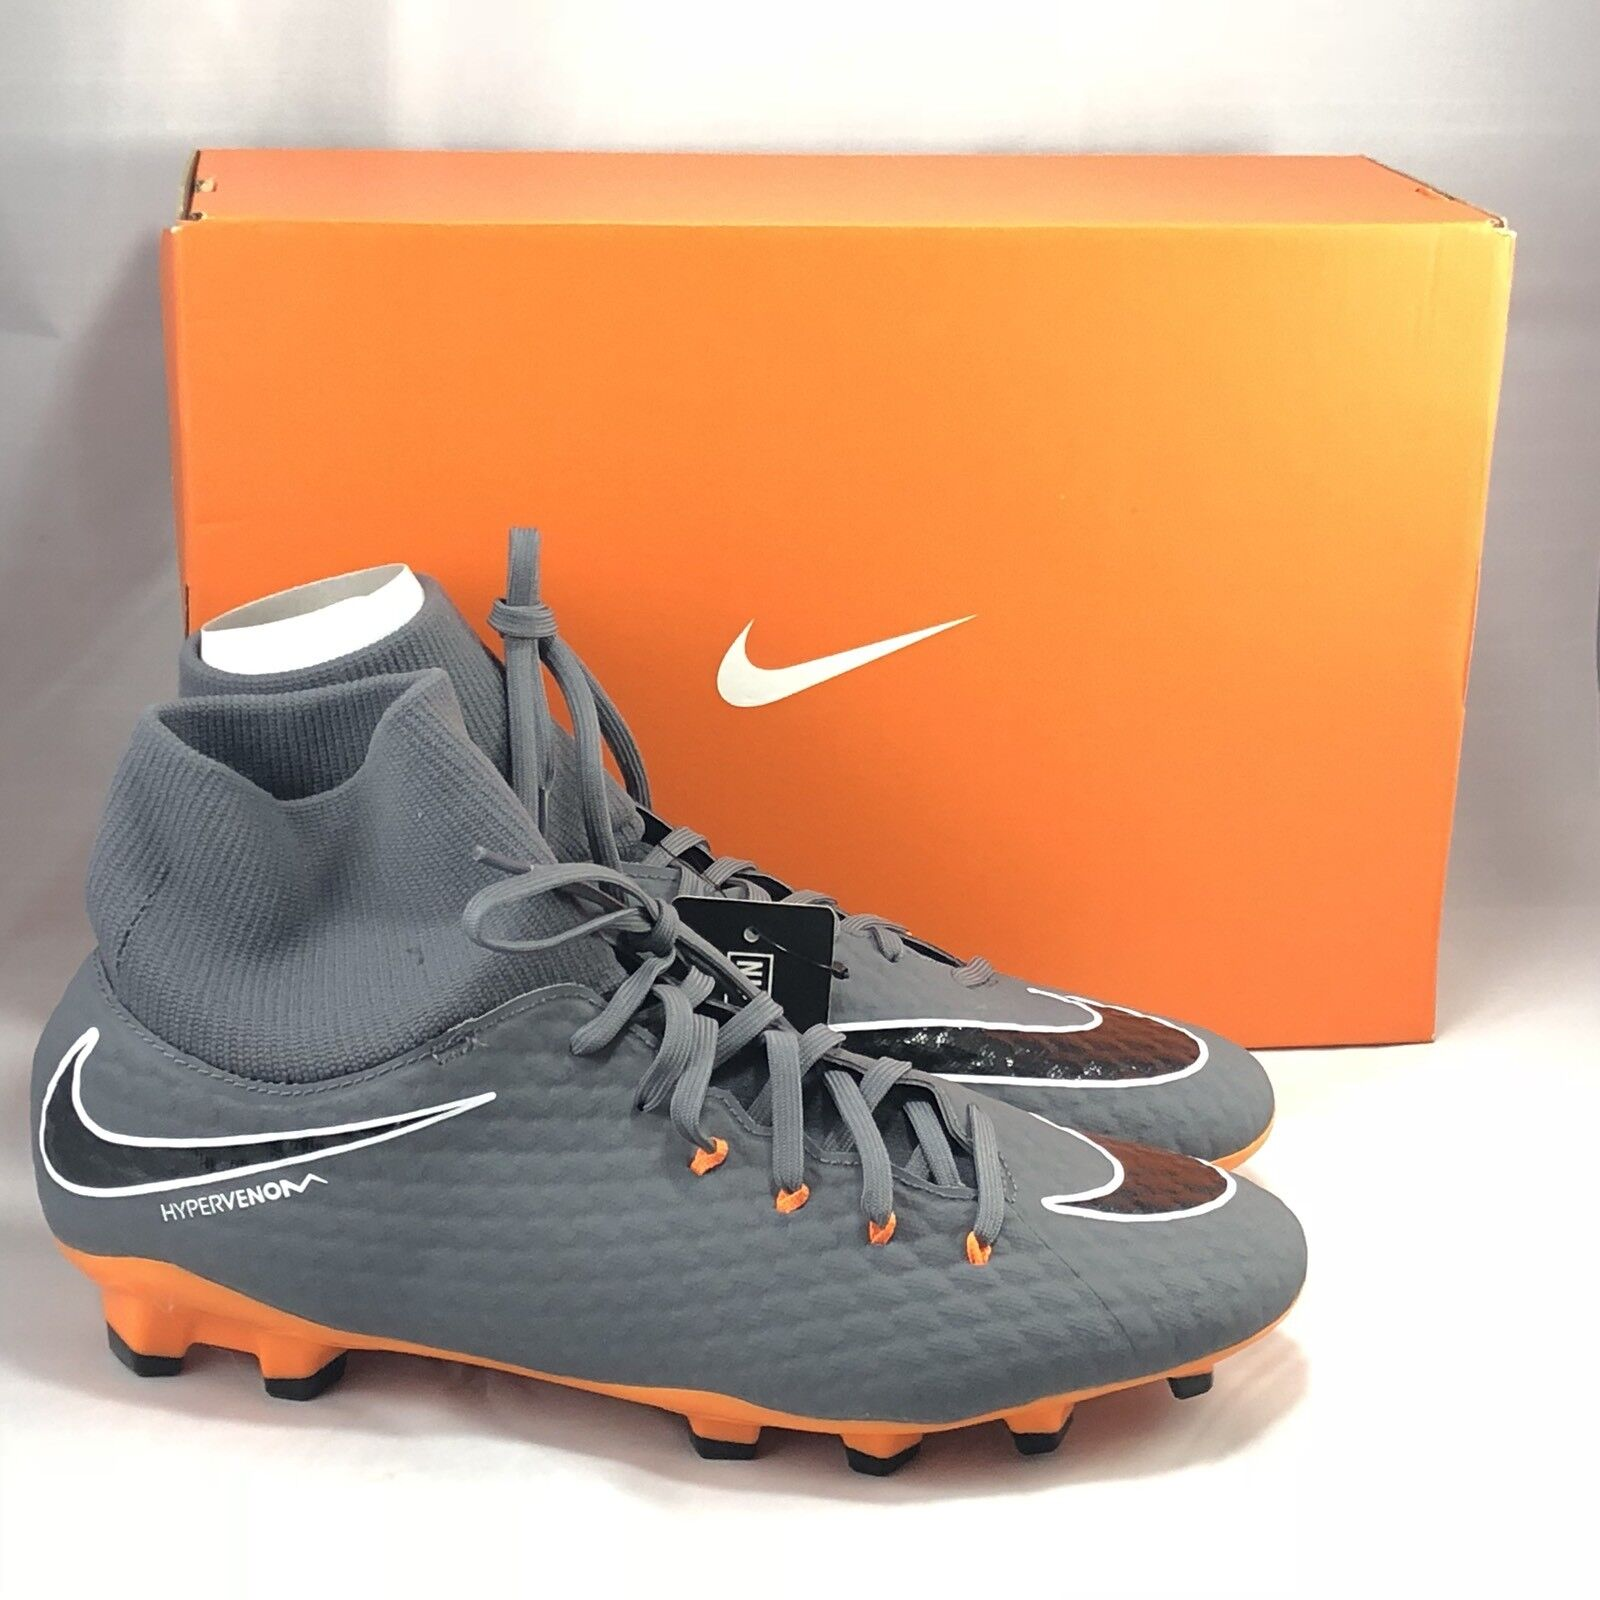 Nike libera rn rn libera cmtr 2017 Uomo correndo i formatori 880841 scarpe scarpe 600 30ac13